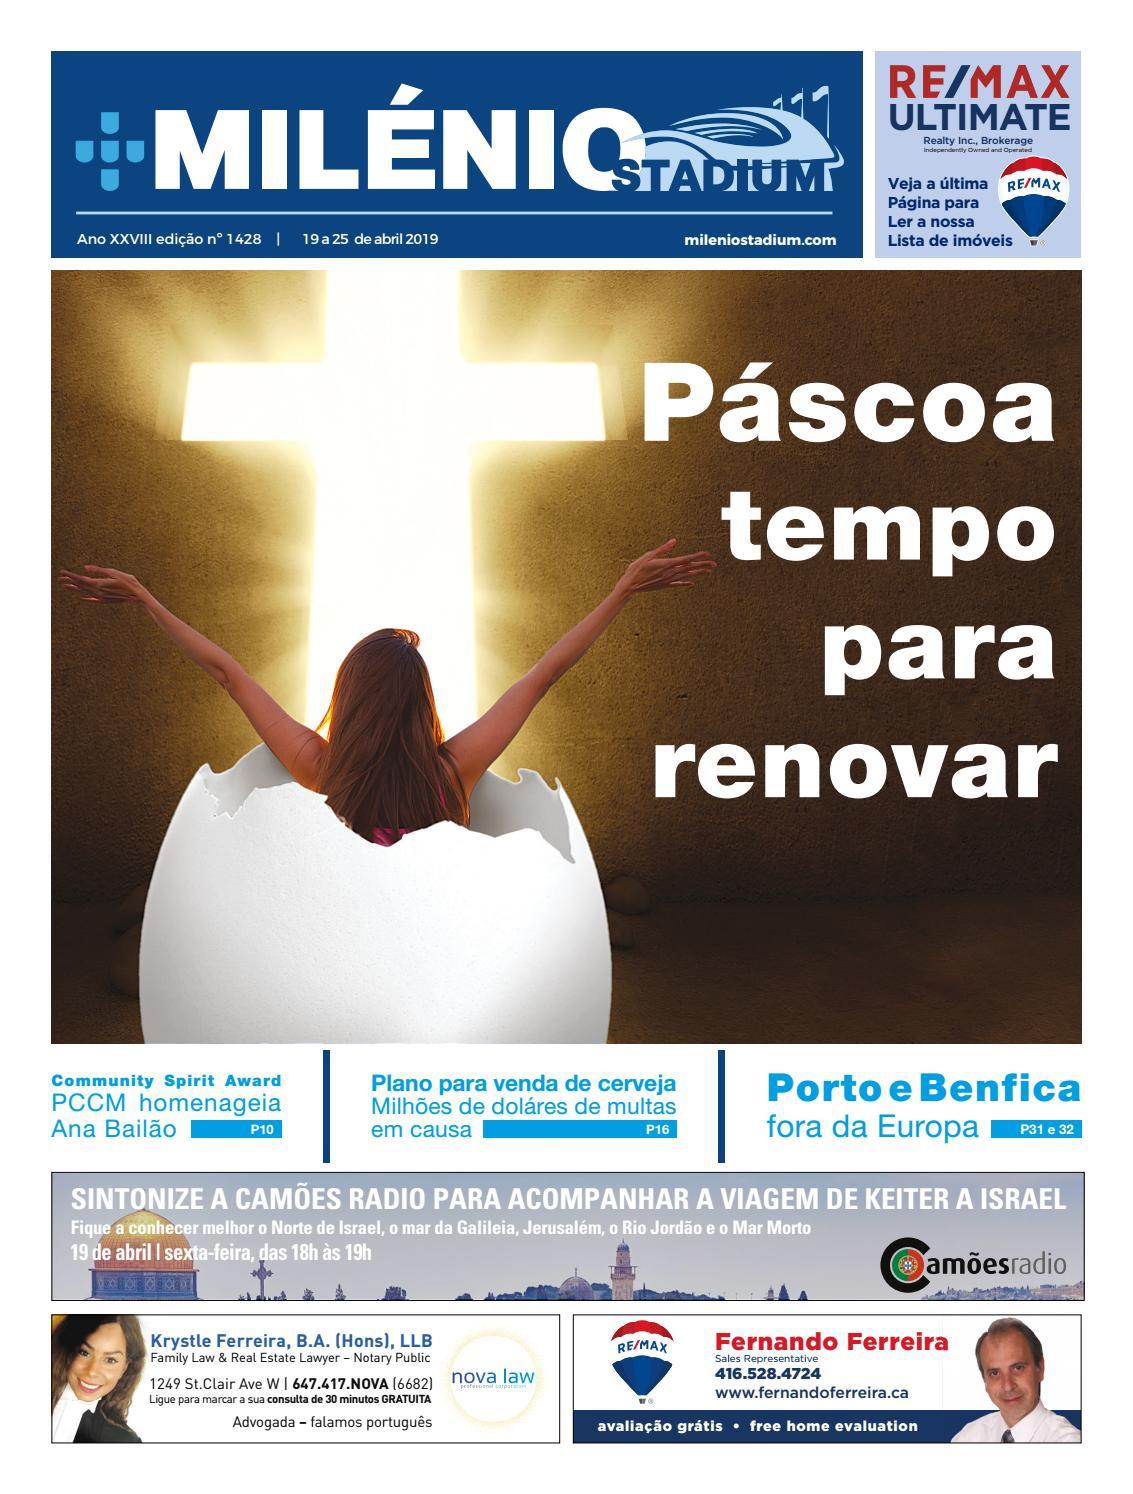 d76711d6e Milénio Stadium - Edição 1428 - 2019-04-19 by Milénio Stadium - issuu